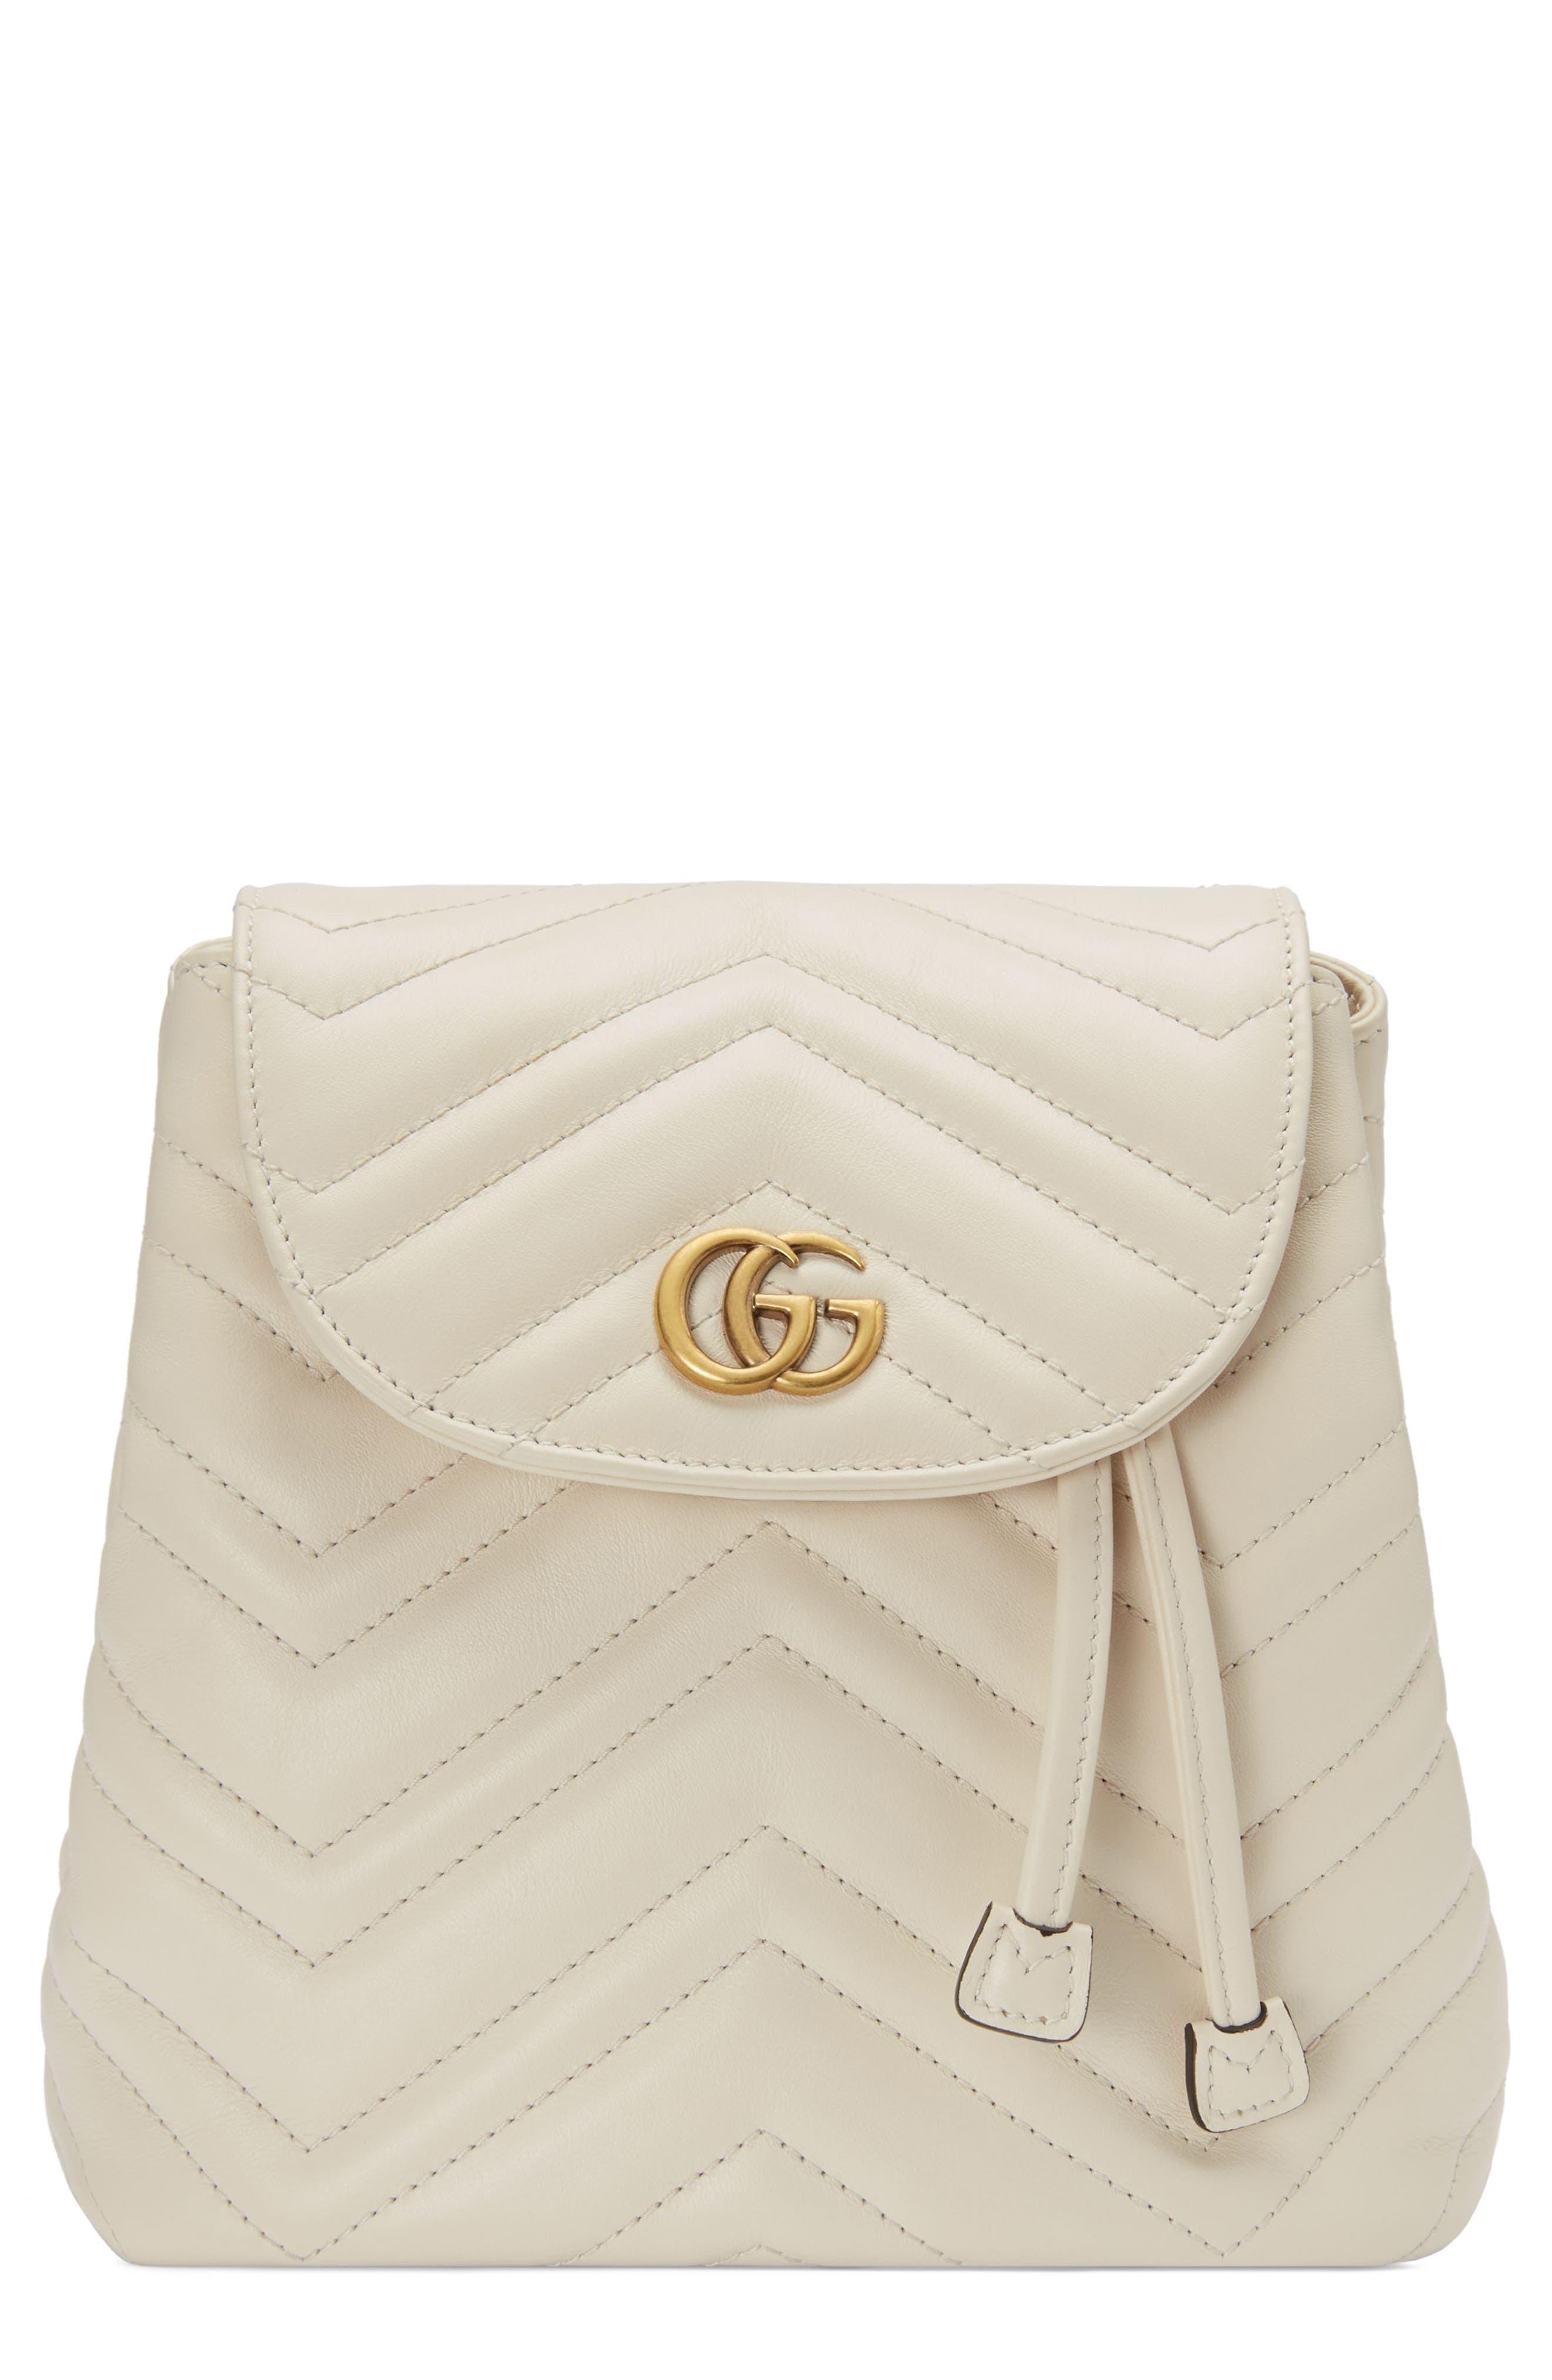 GUCCI GG Marmont 2.0 Matelassé Leather Mini Backpack, Main, color, MYSTIC WHITE